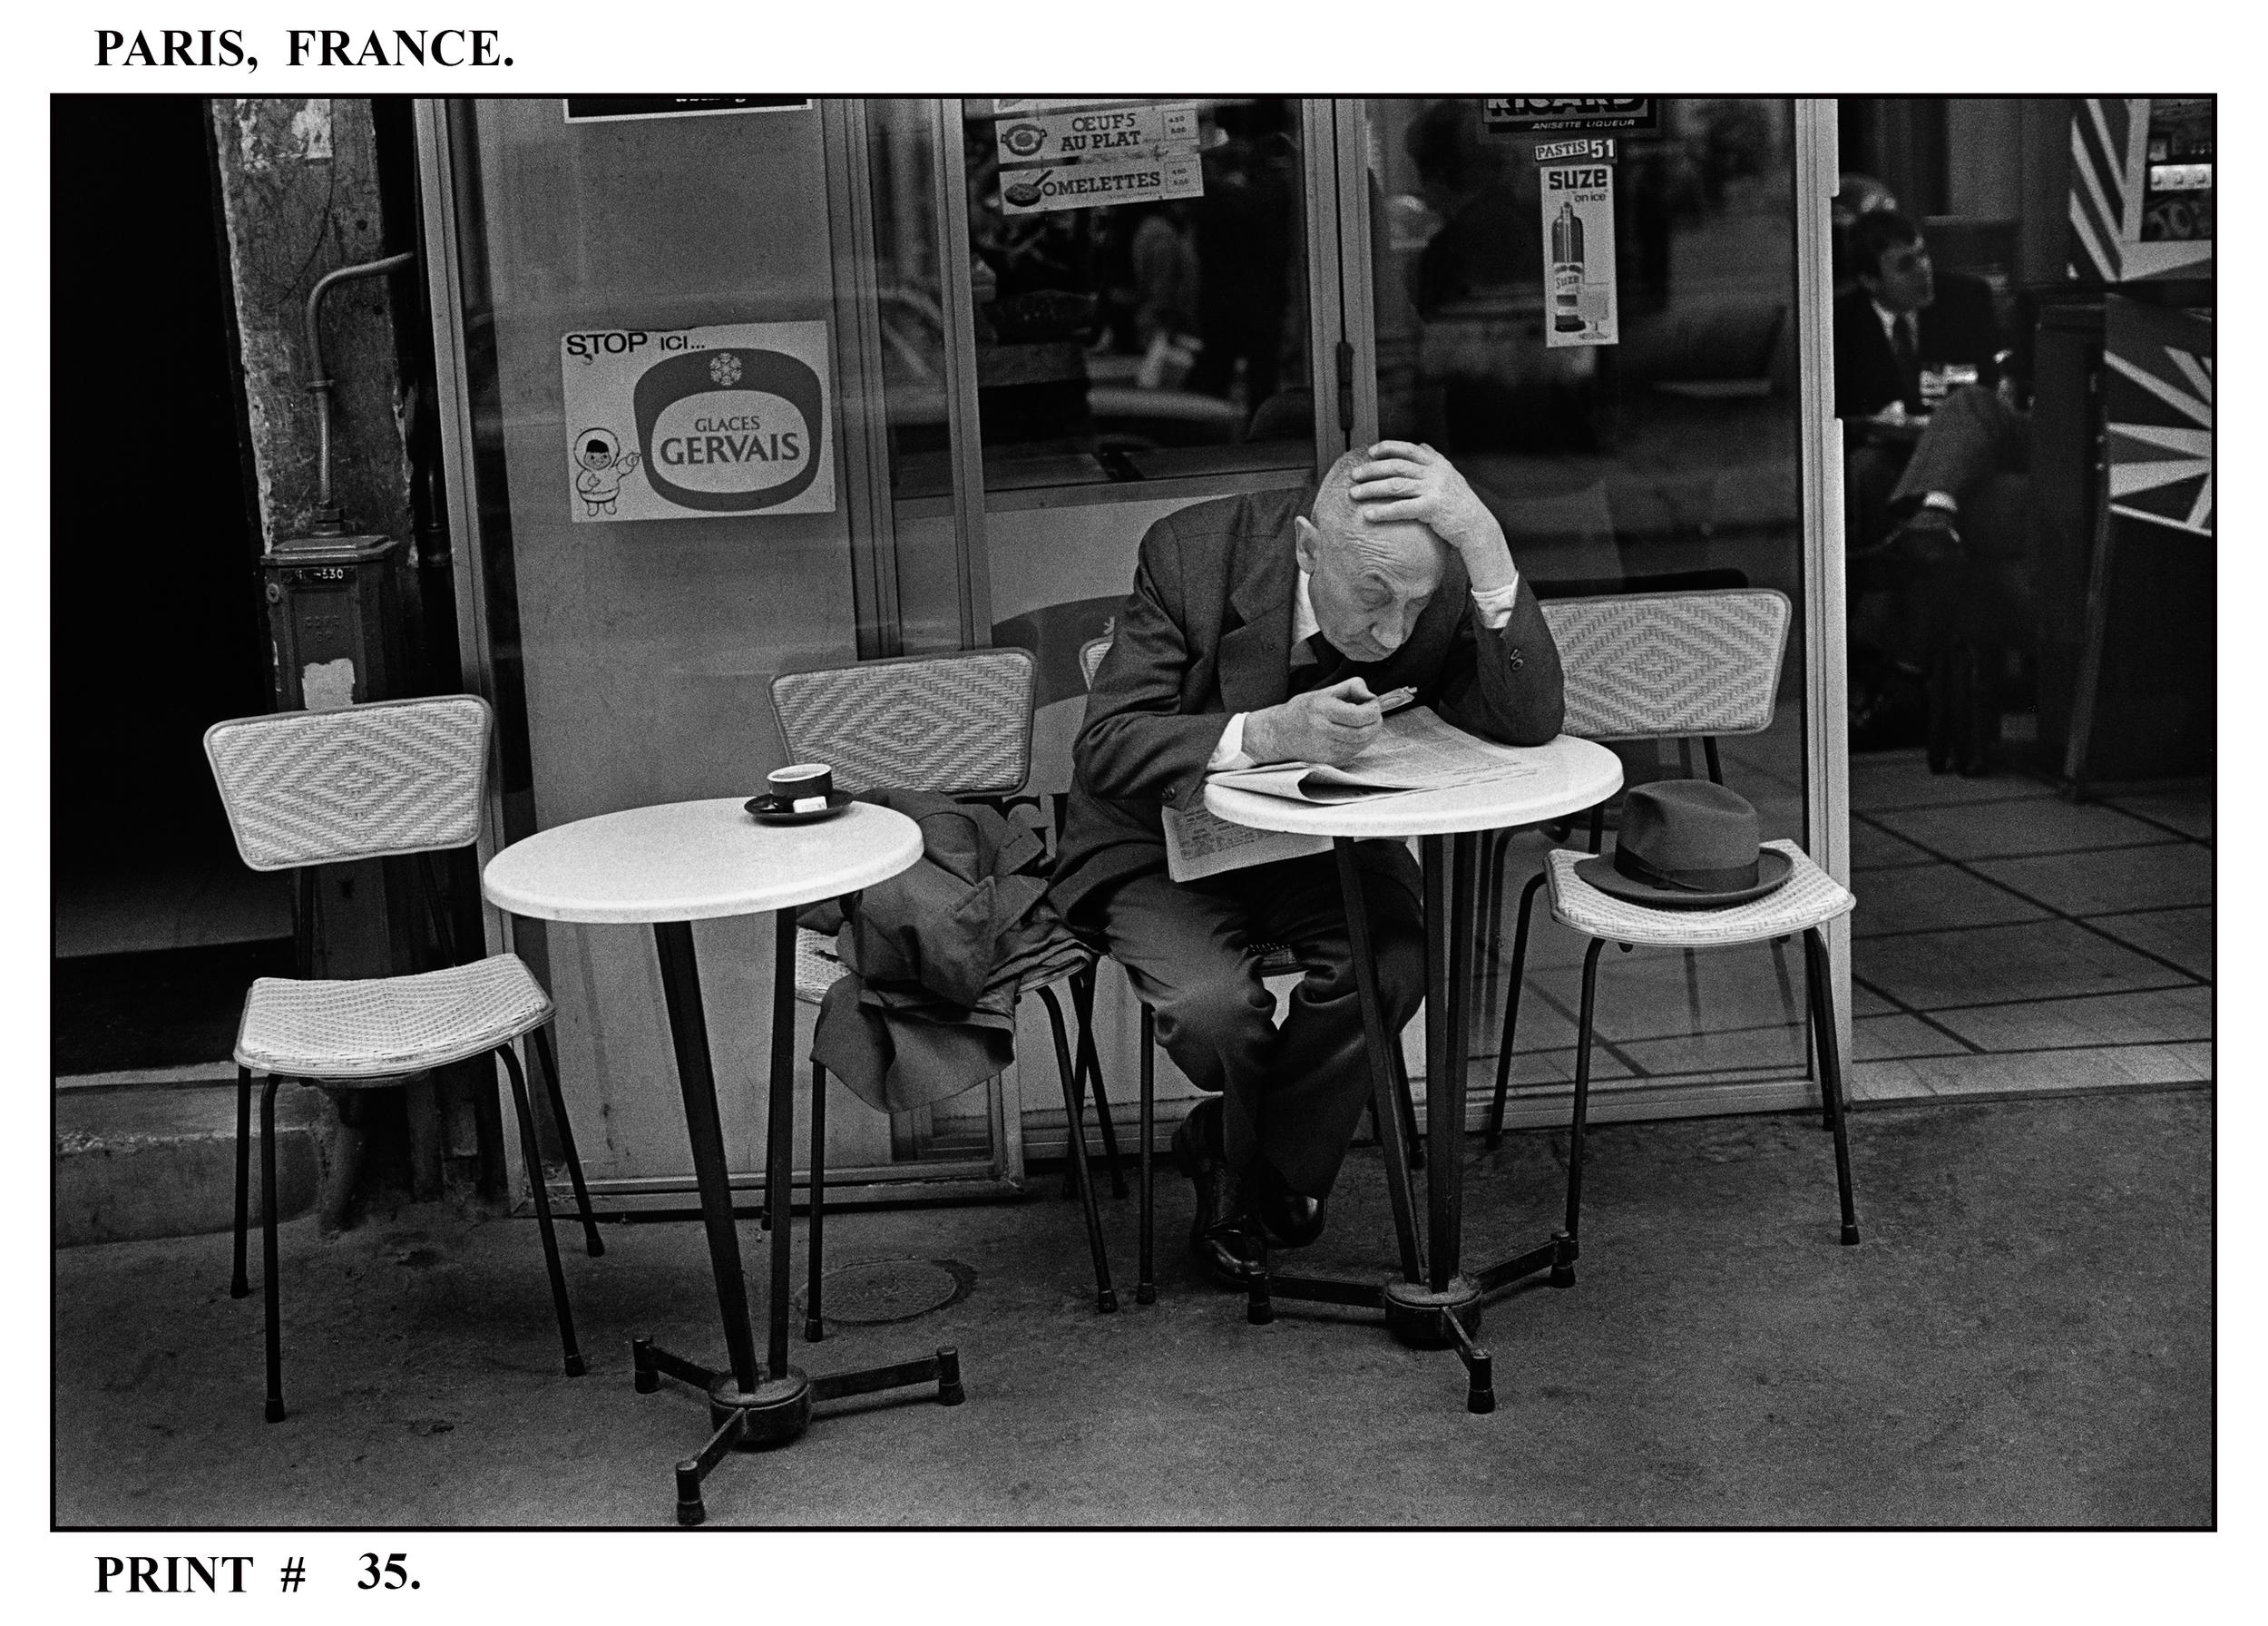 035PARIS, FRANCE copy.jpg